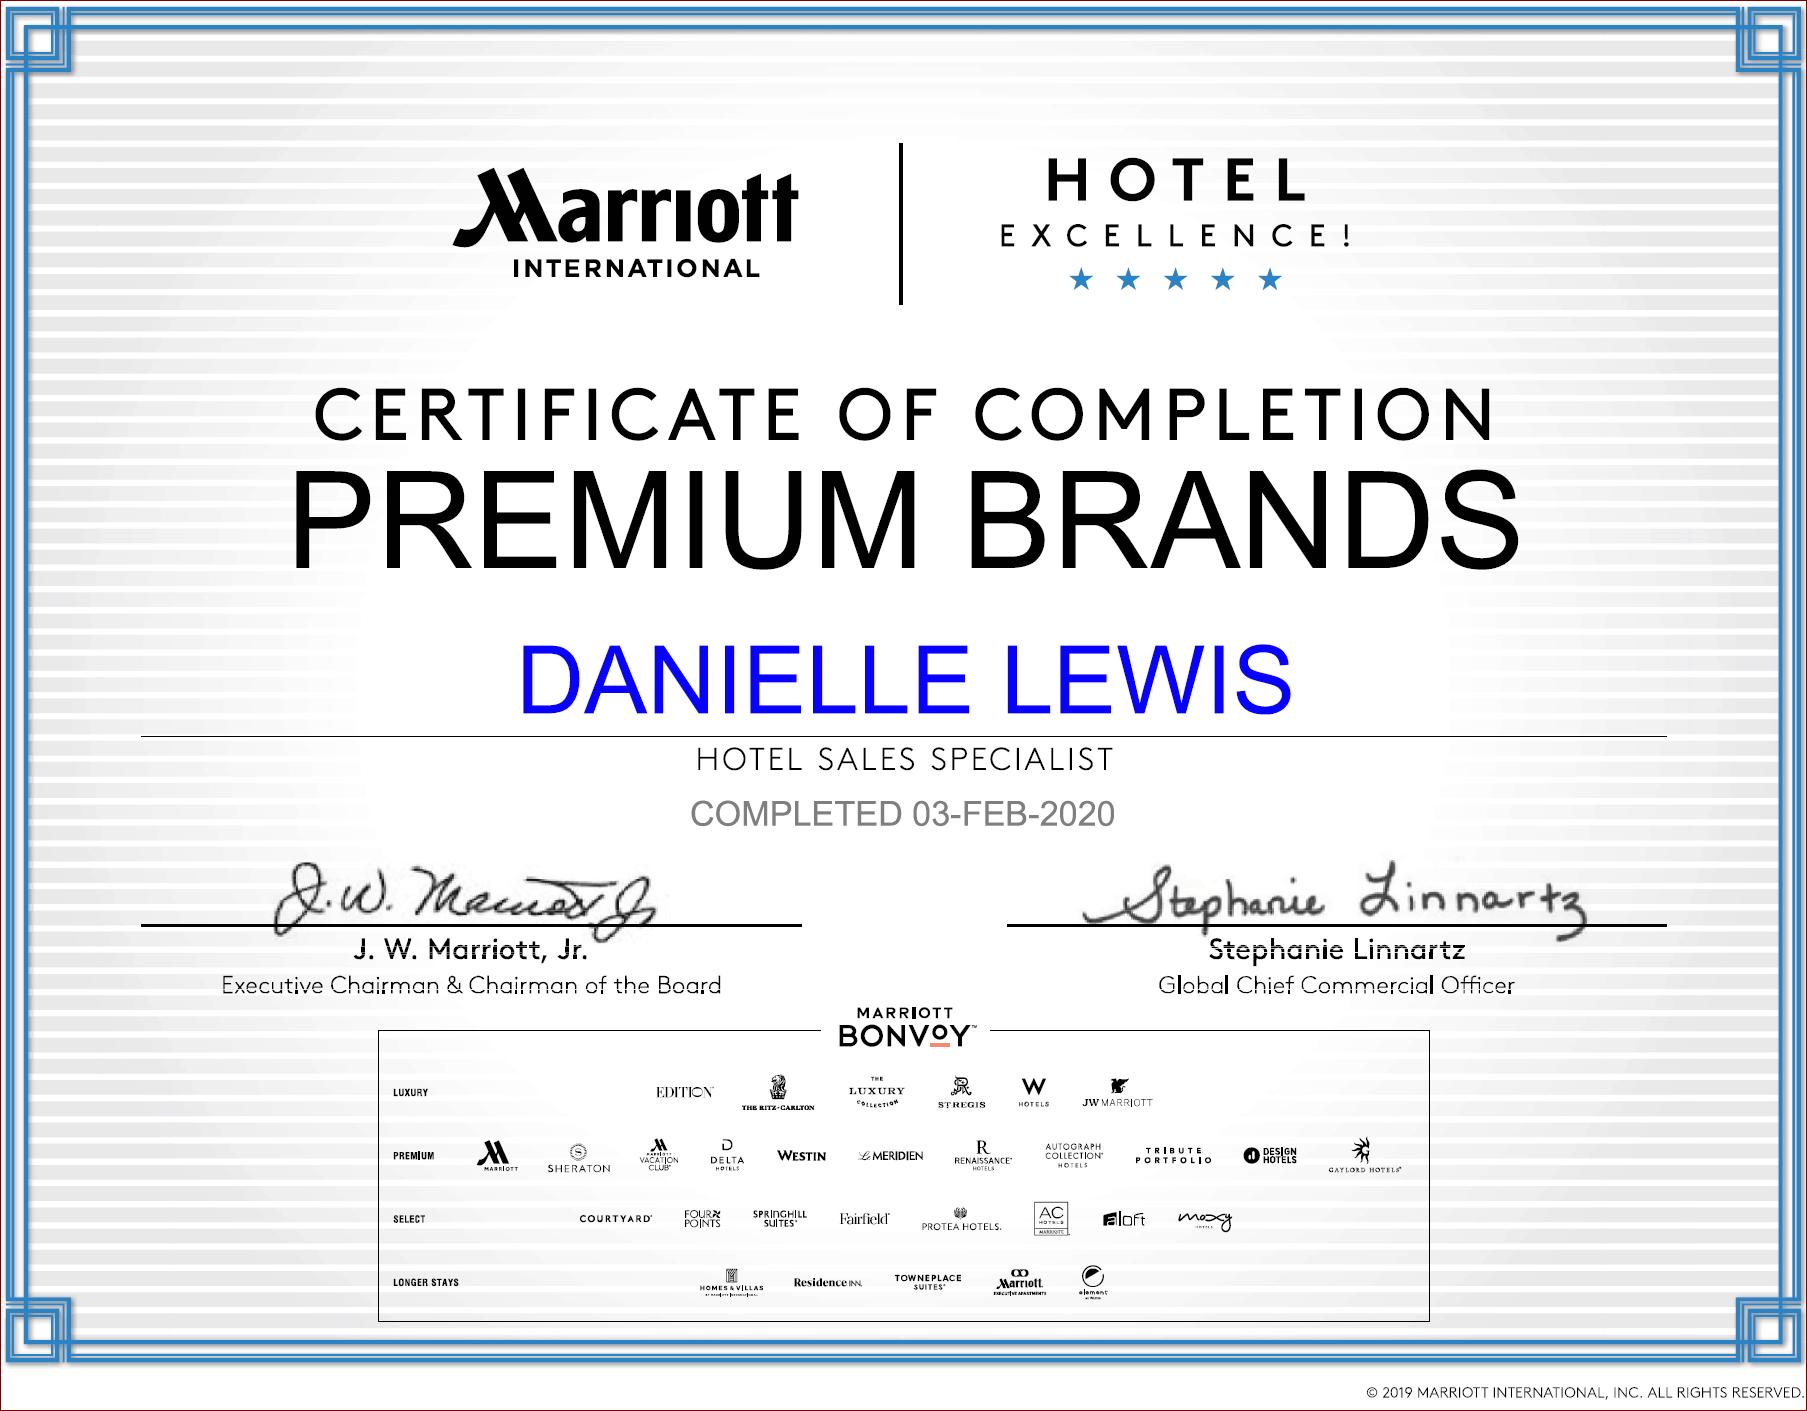 SelfishMe Travel - Marriott International Premium Brands Certificate